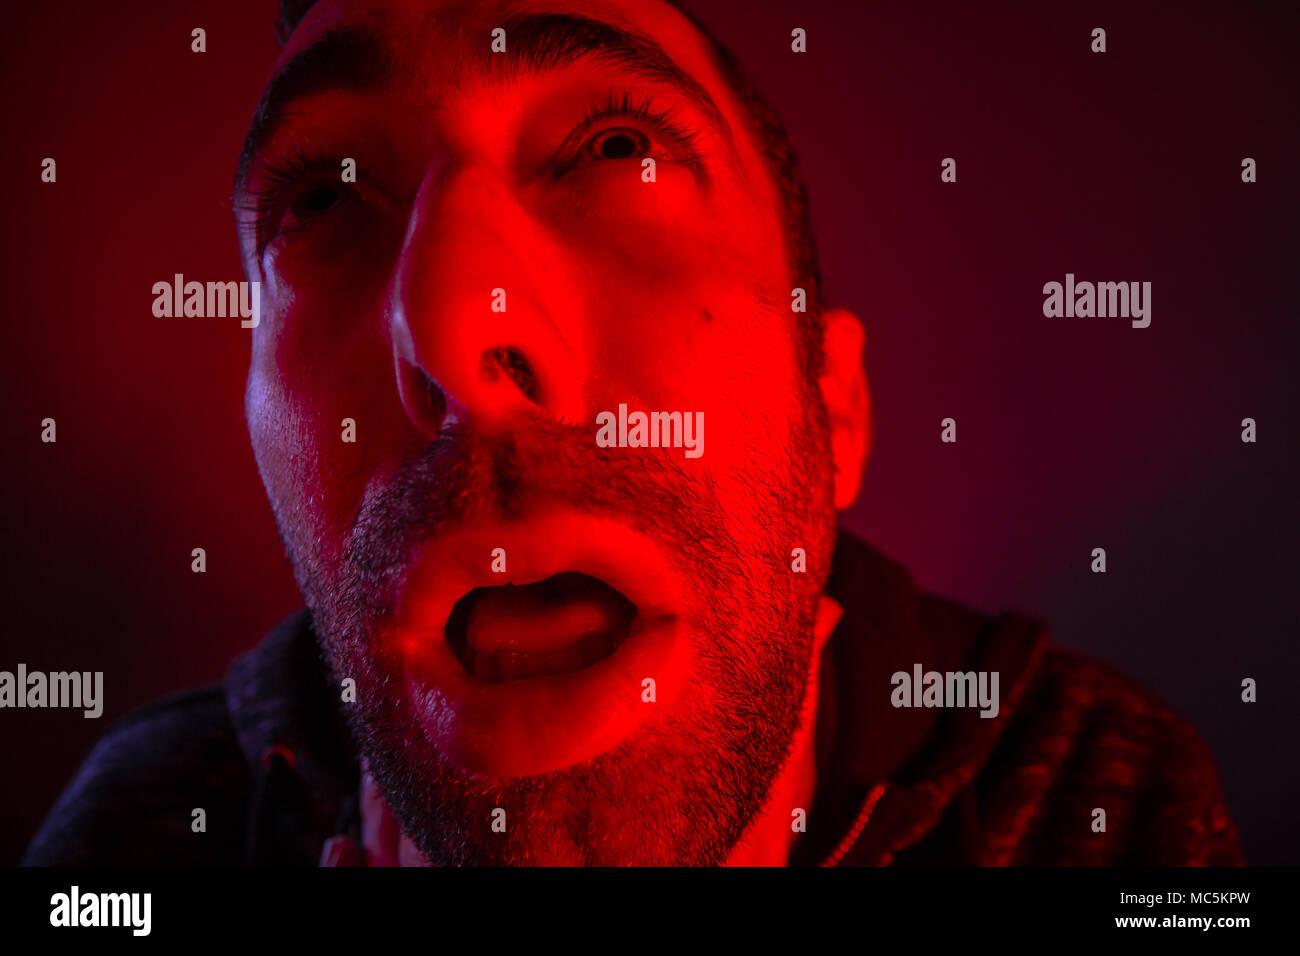 Depressed stressed man strangling himself. Close up headshot portrait of man chokes - Stock Image